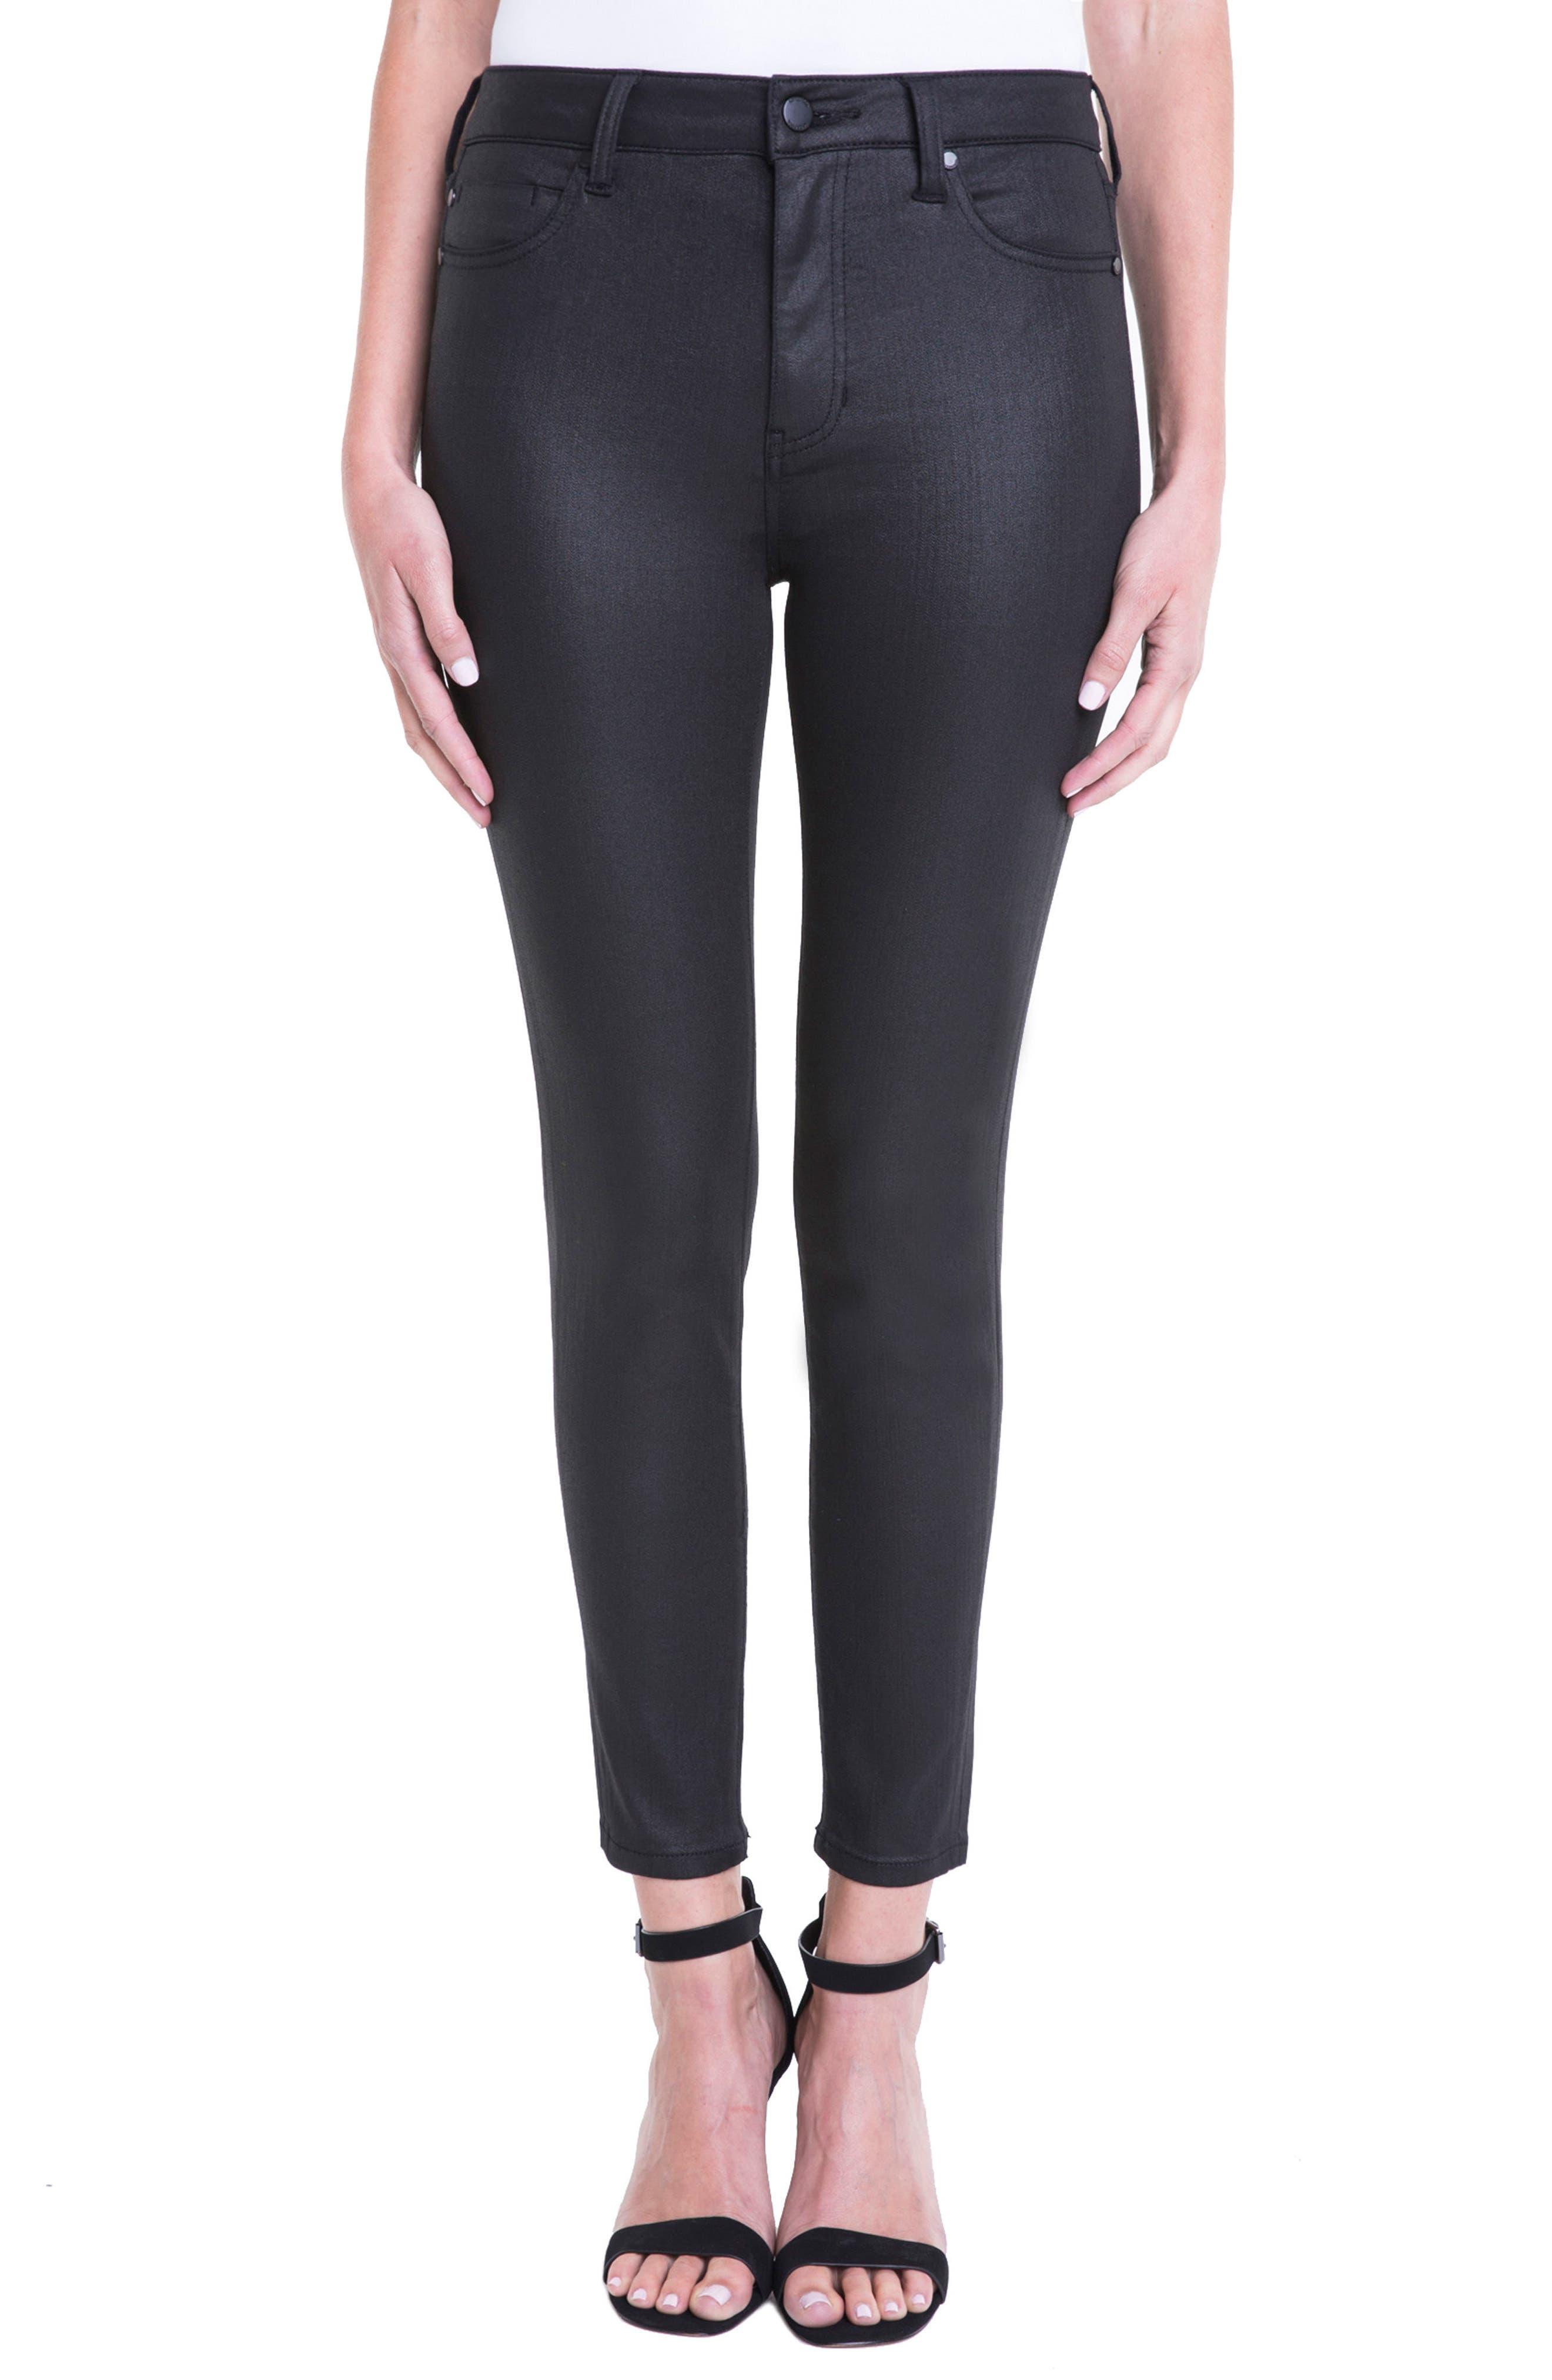 Jeans Company Bridget High Waist Skinny Jeans,                         Main,                         color, 001